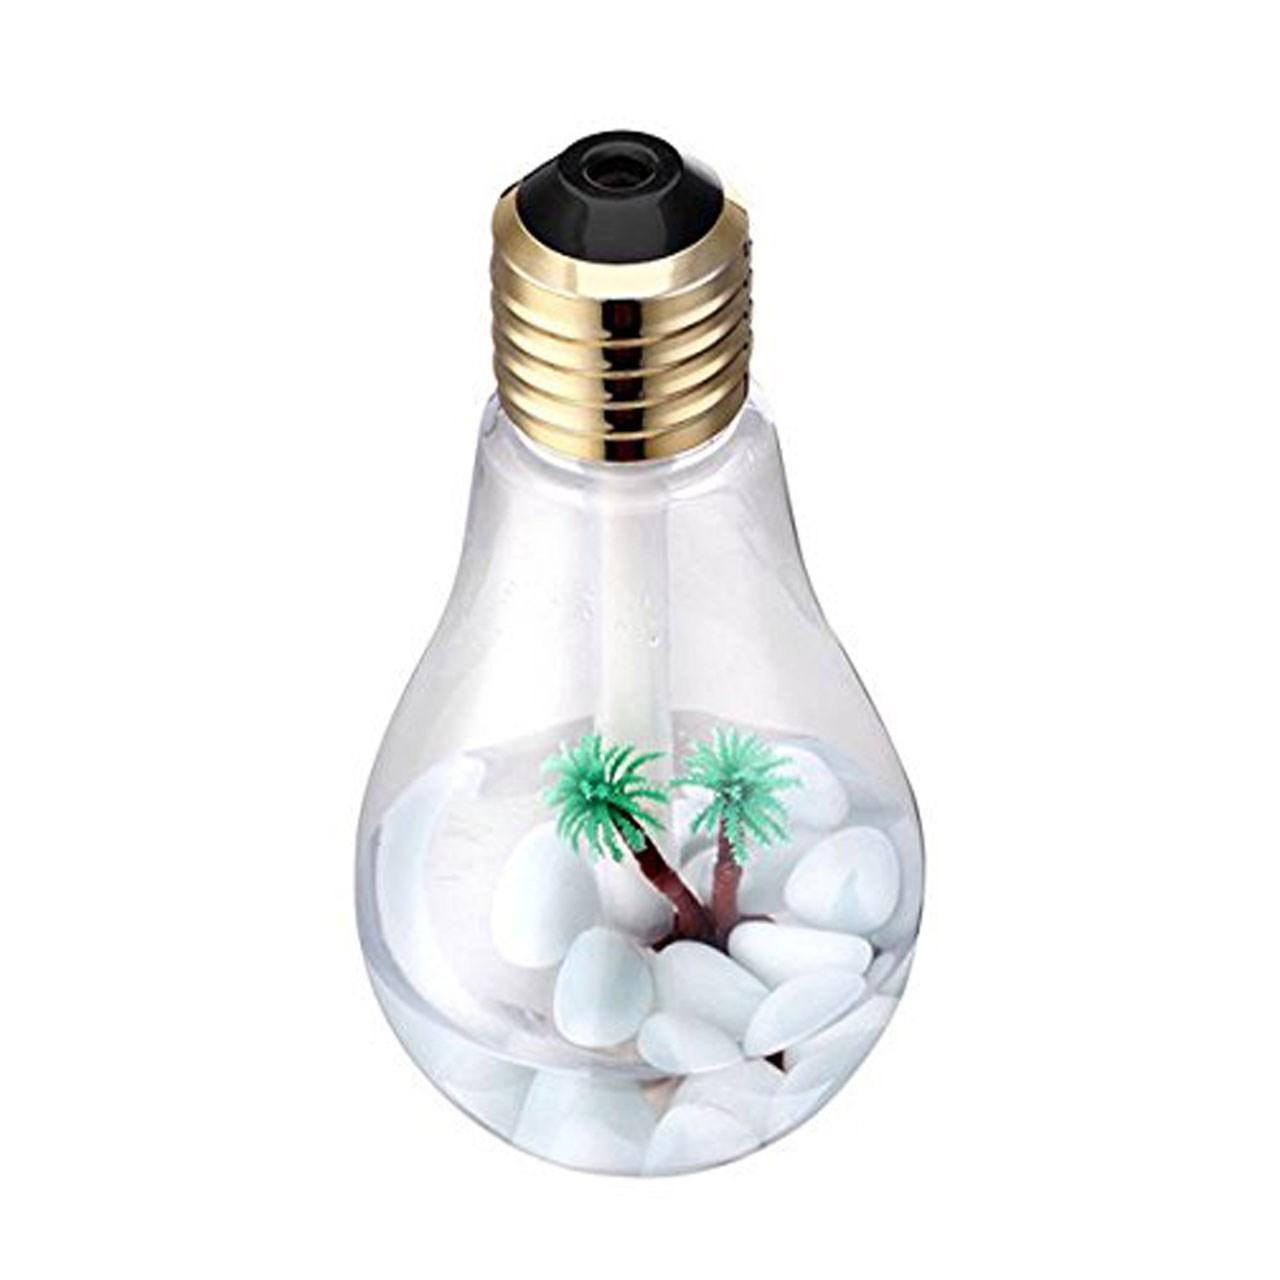 بخور سرد بانومد مدل Bulb Humidifier